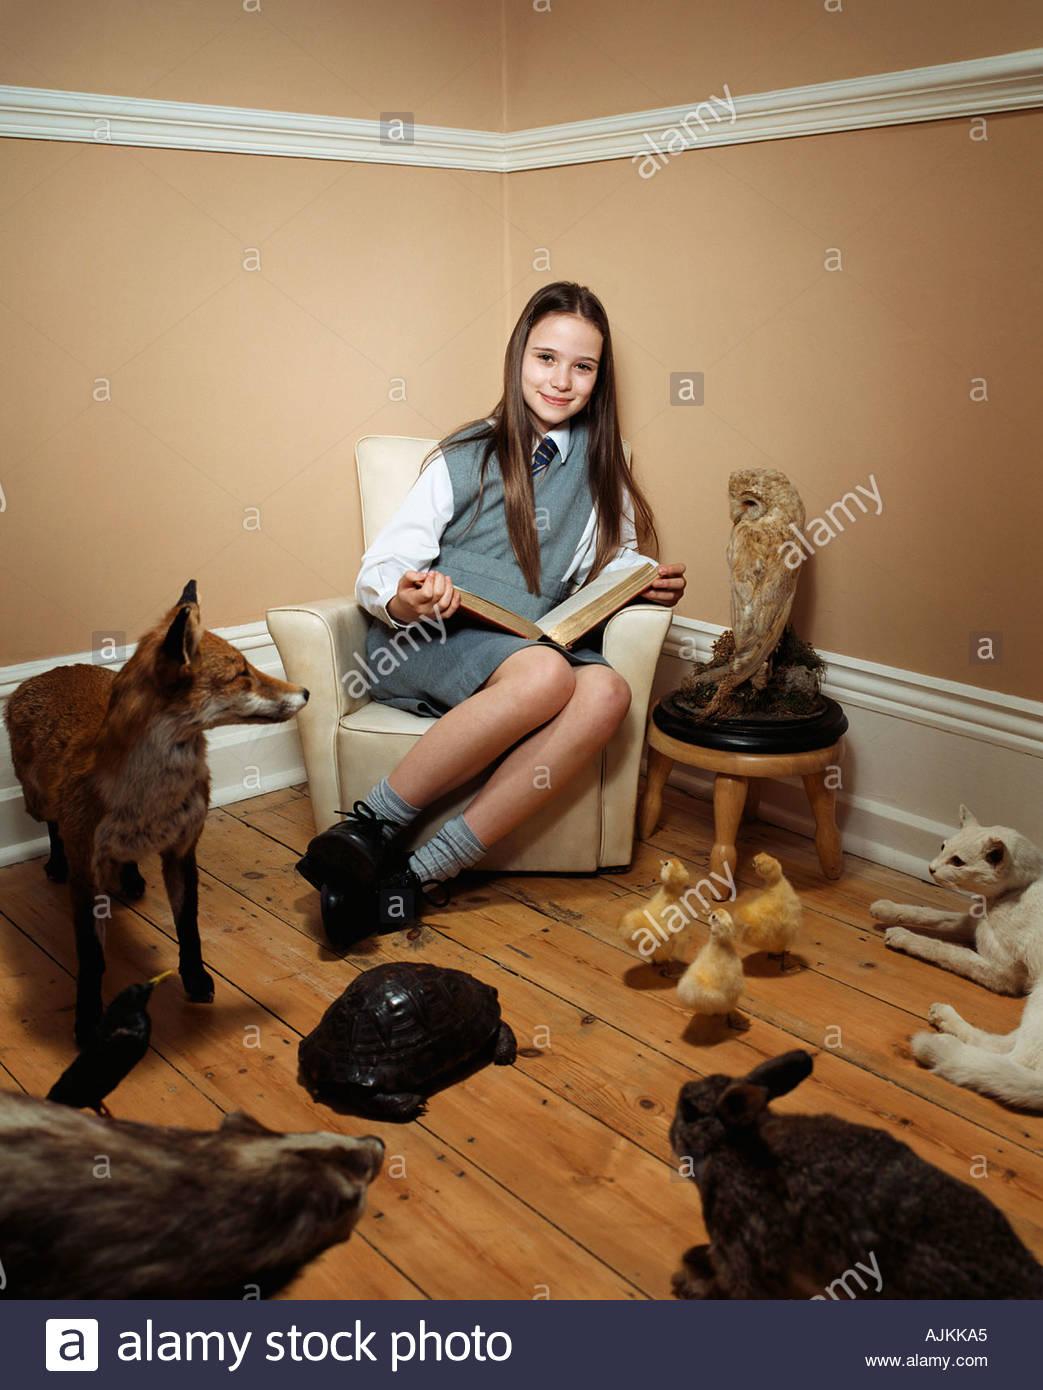 Girl reading story to stuffed animals - Stock Image